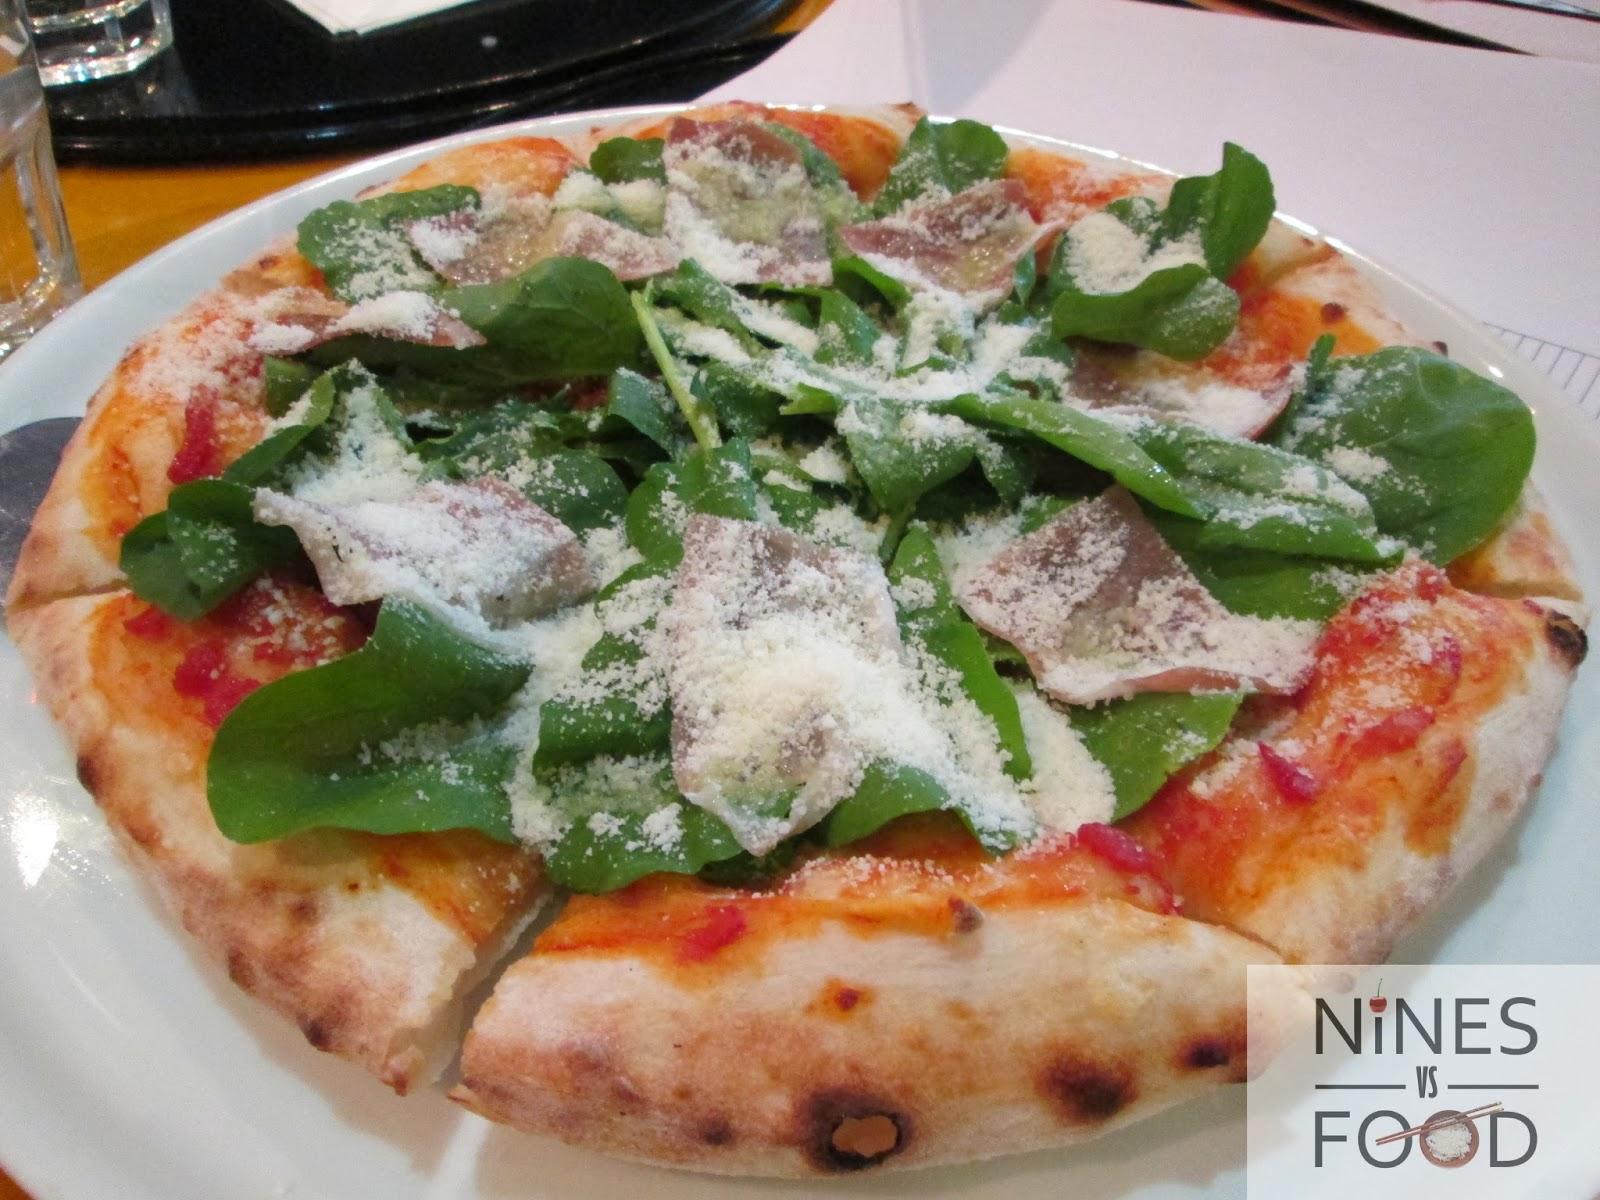 Nines vs. Food - Yomenya Goemon Greenbelt 3 - 9.jpg